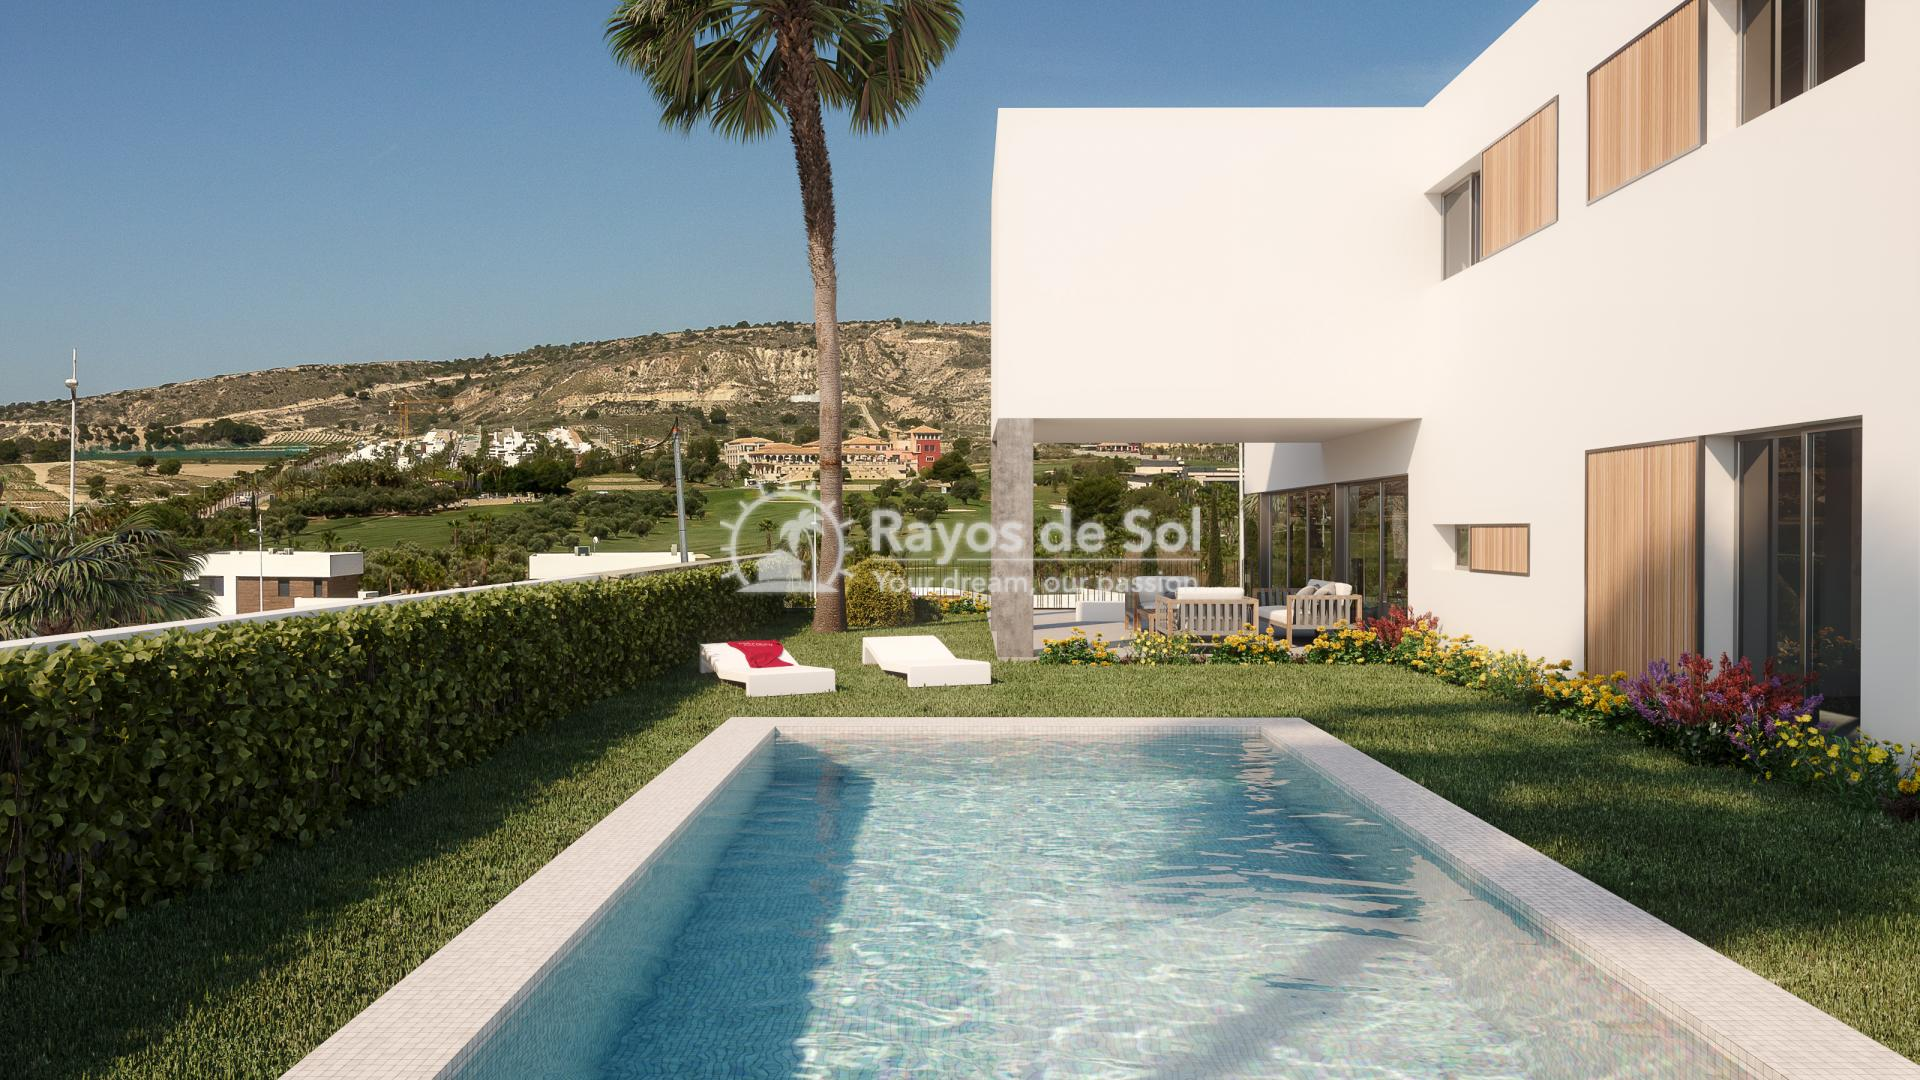 Luxury newbuild villa in La Finca Golf, Algorfa, Costa Blanca (LFPADI) - 3